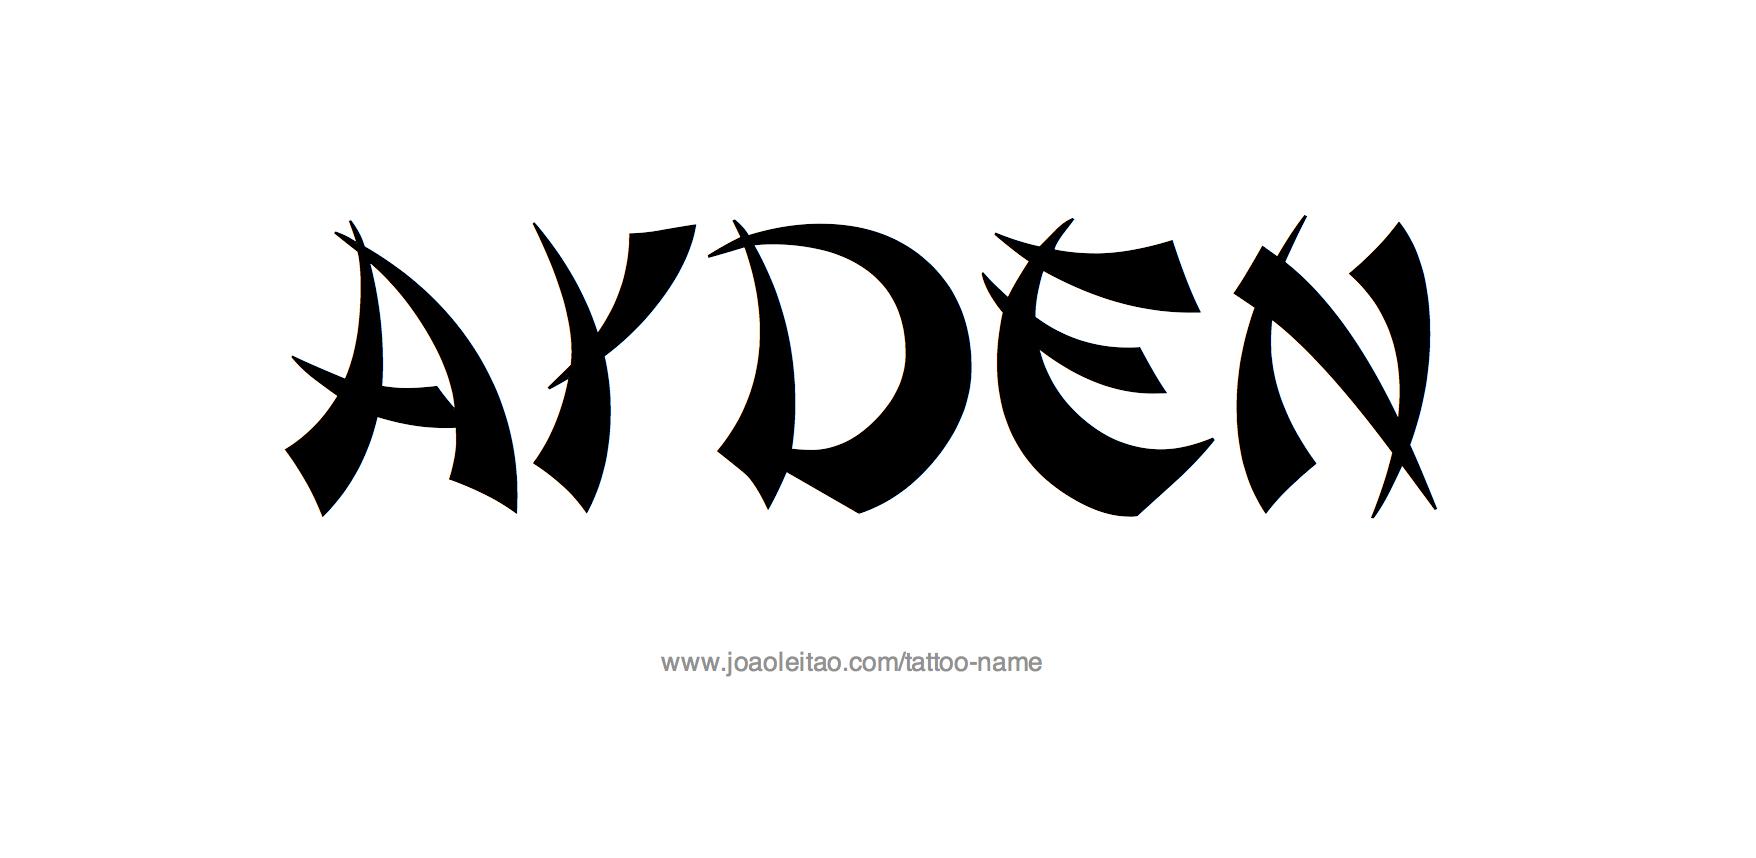 Tattoo Design Name Ayden